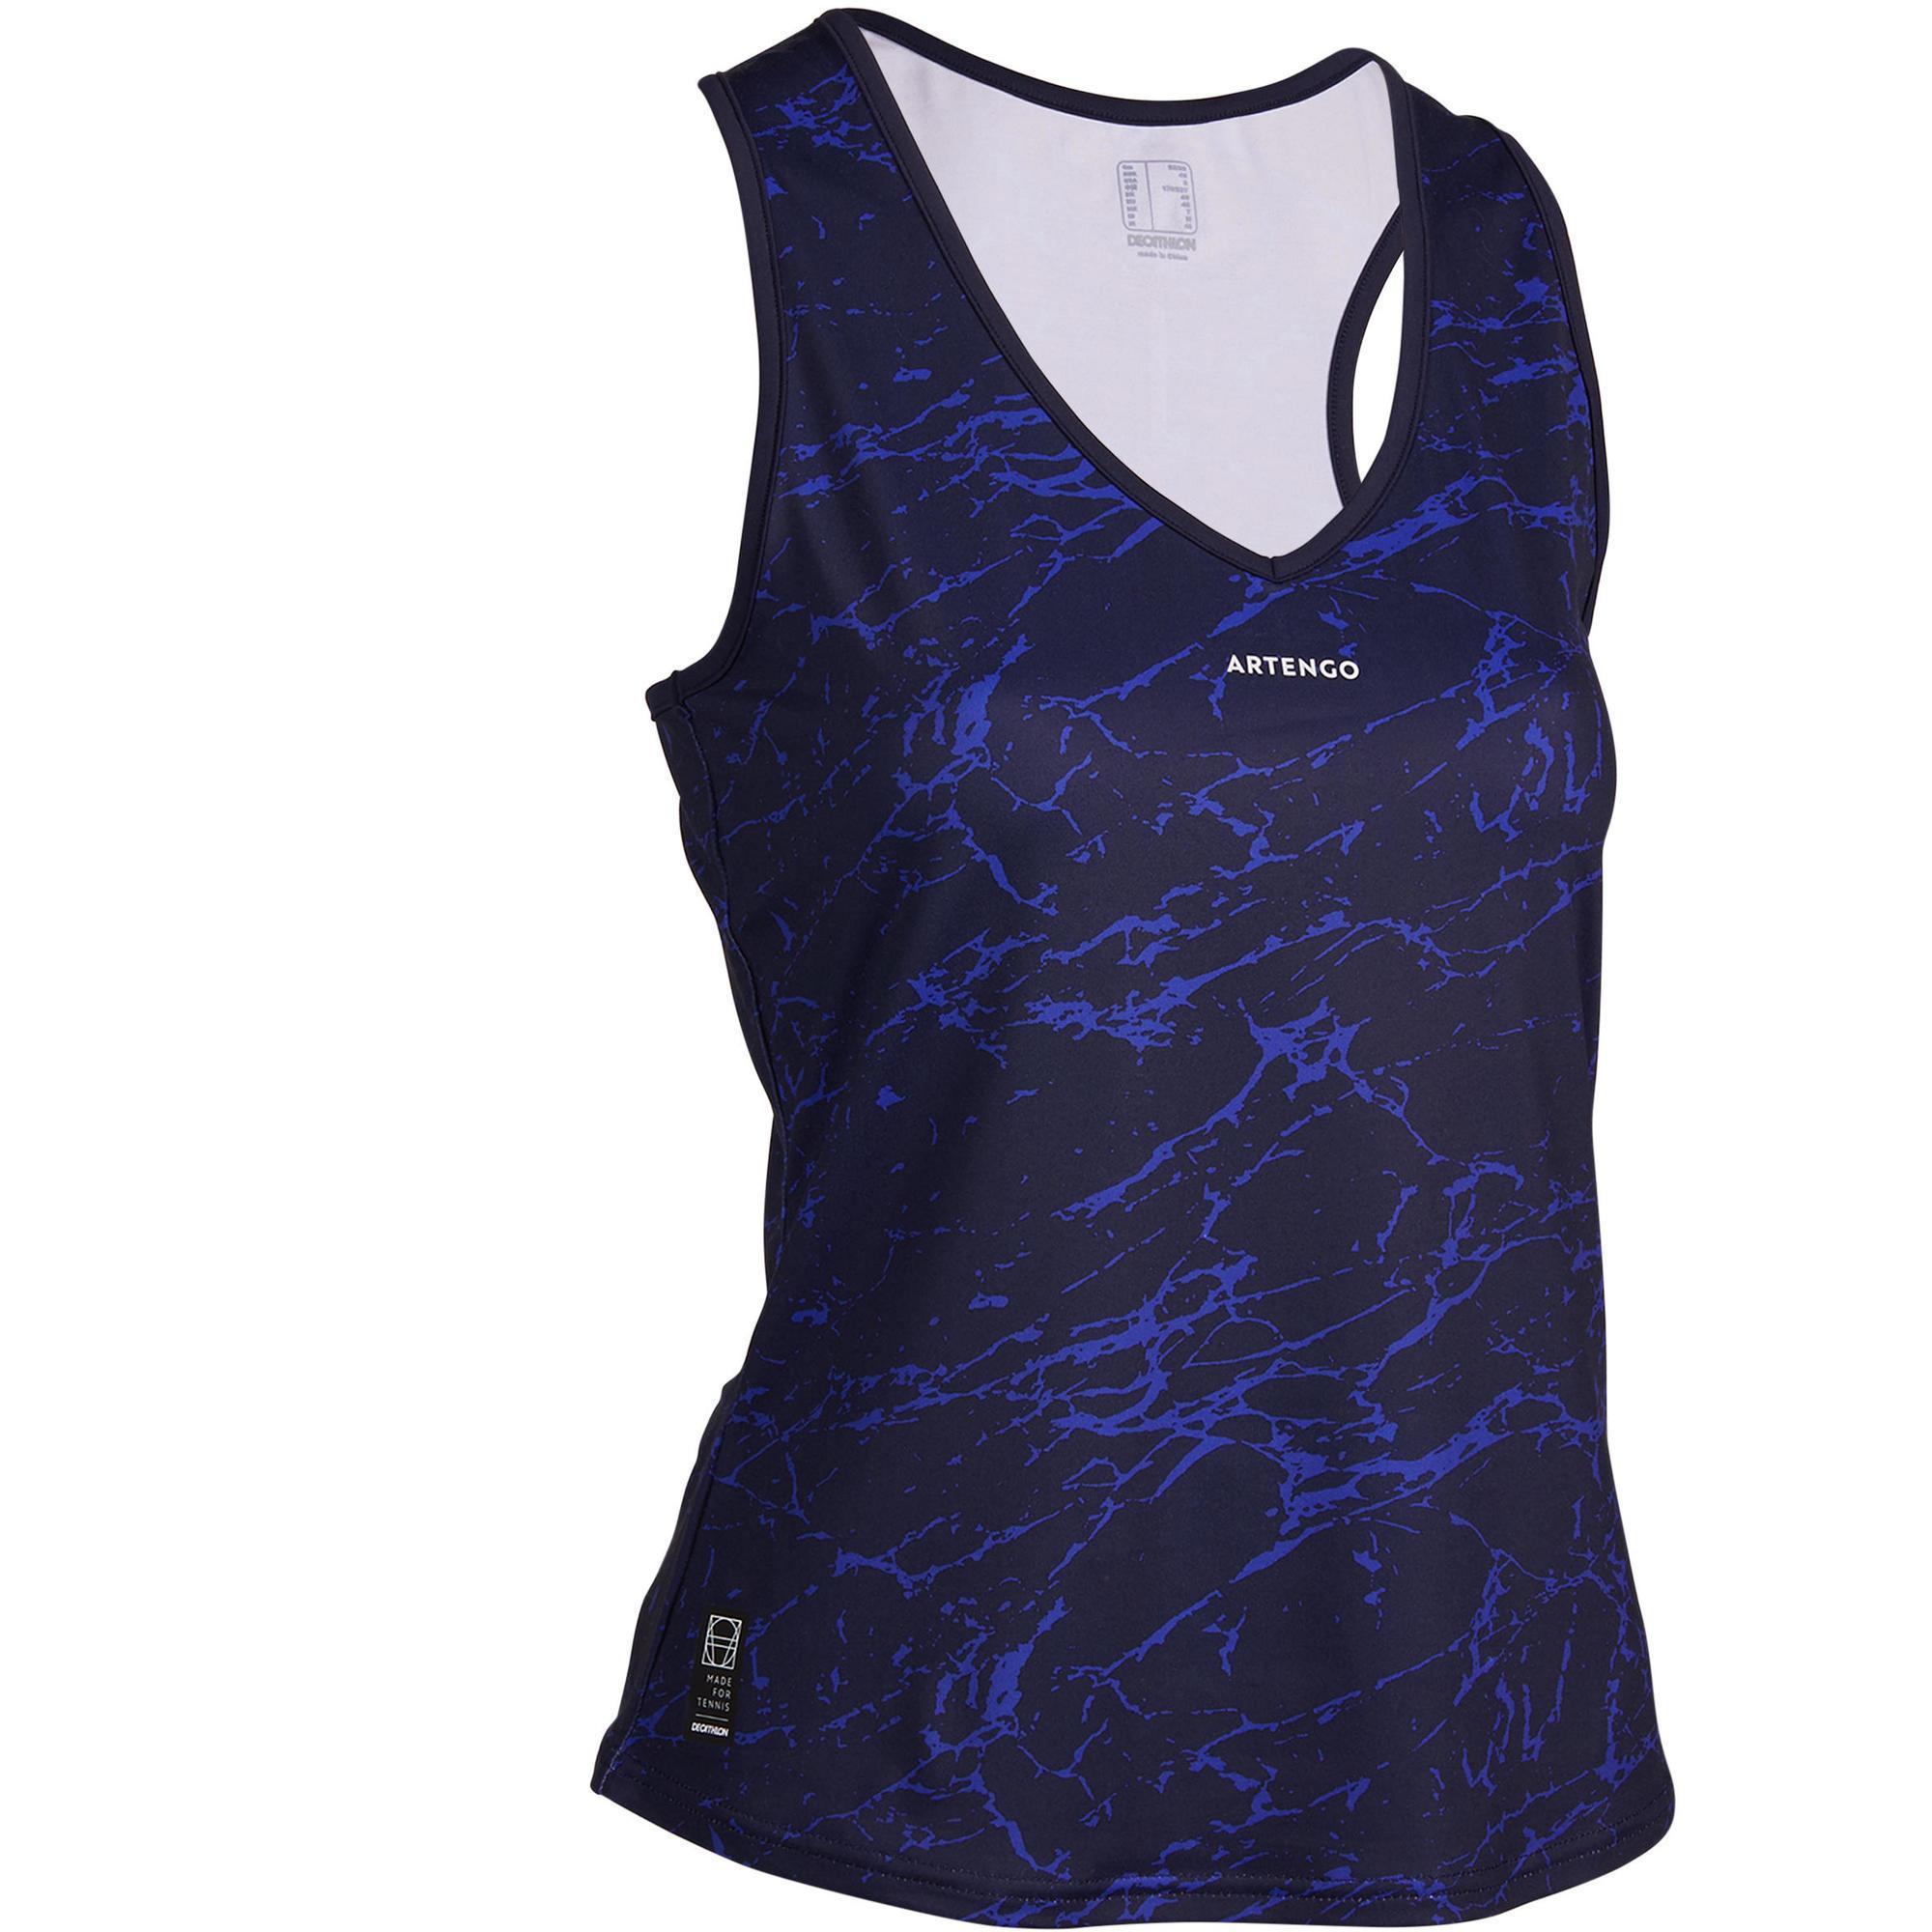 Tennis-Top TK Light 900 Damen marineblau   Sportbekleidung > Sporttops > Tennistops   Blau   Artengo